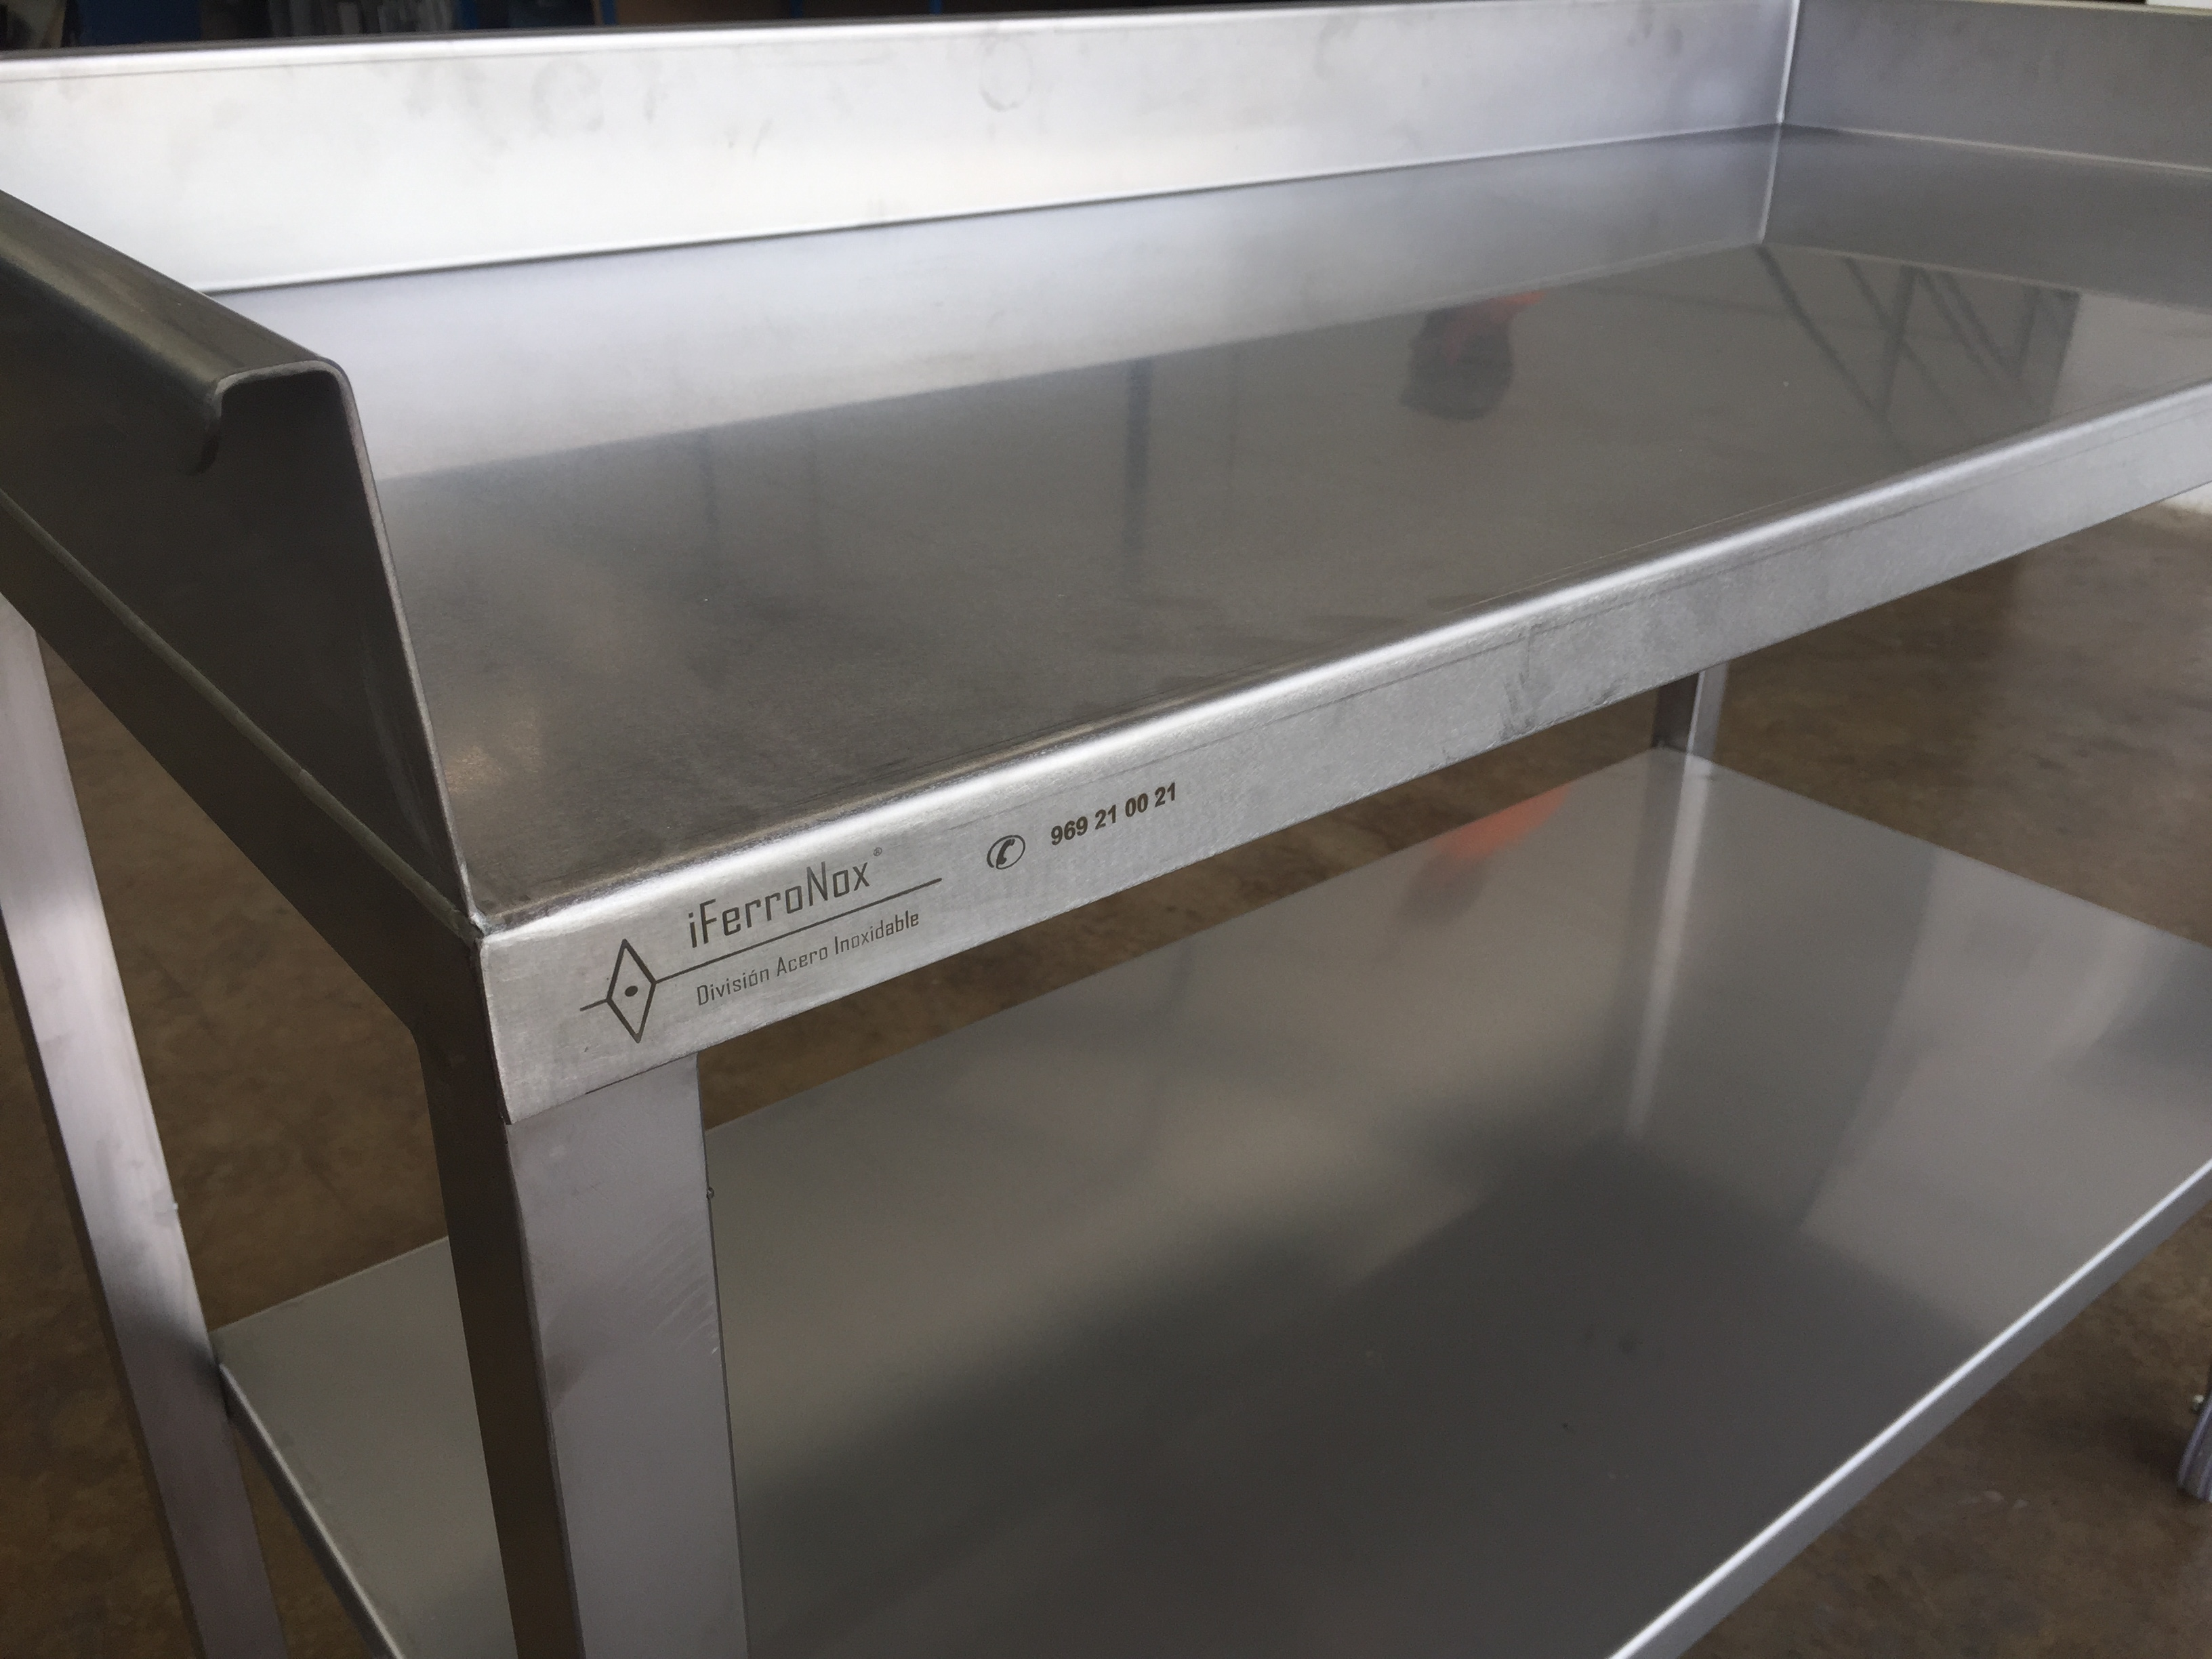 Mesas de acero inoxidable de segunda mano 47807 mesas ideas - Mesa cocina segunda mano ...